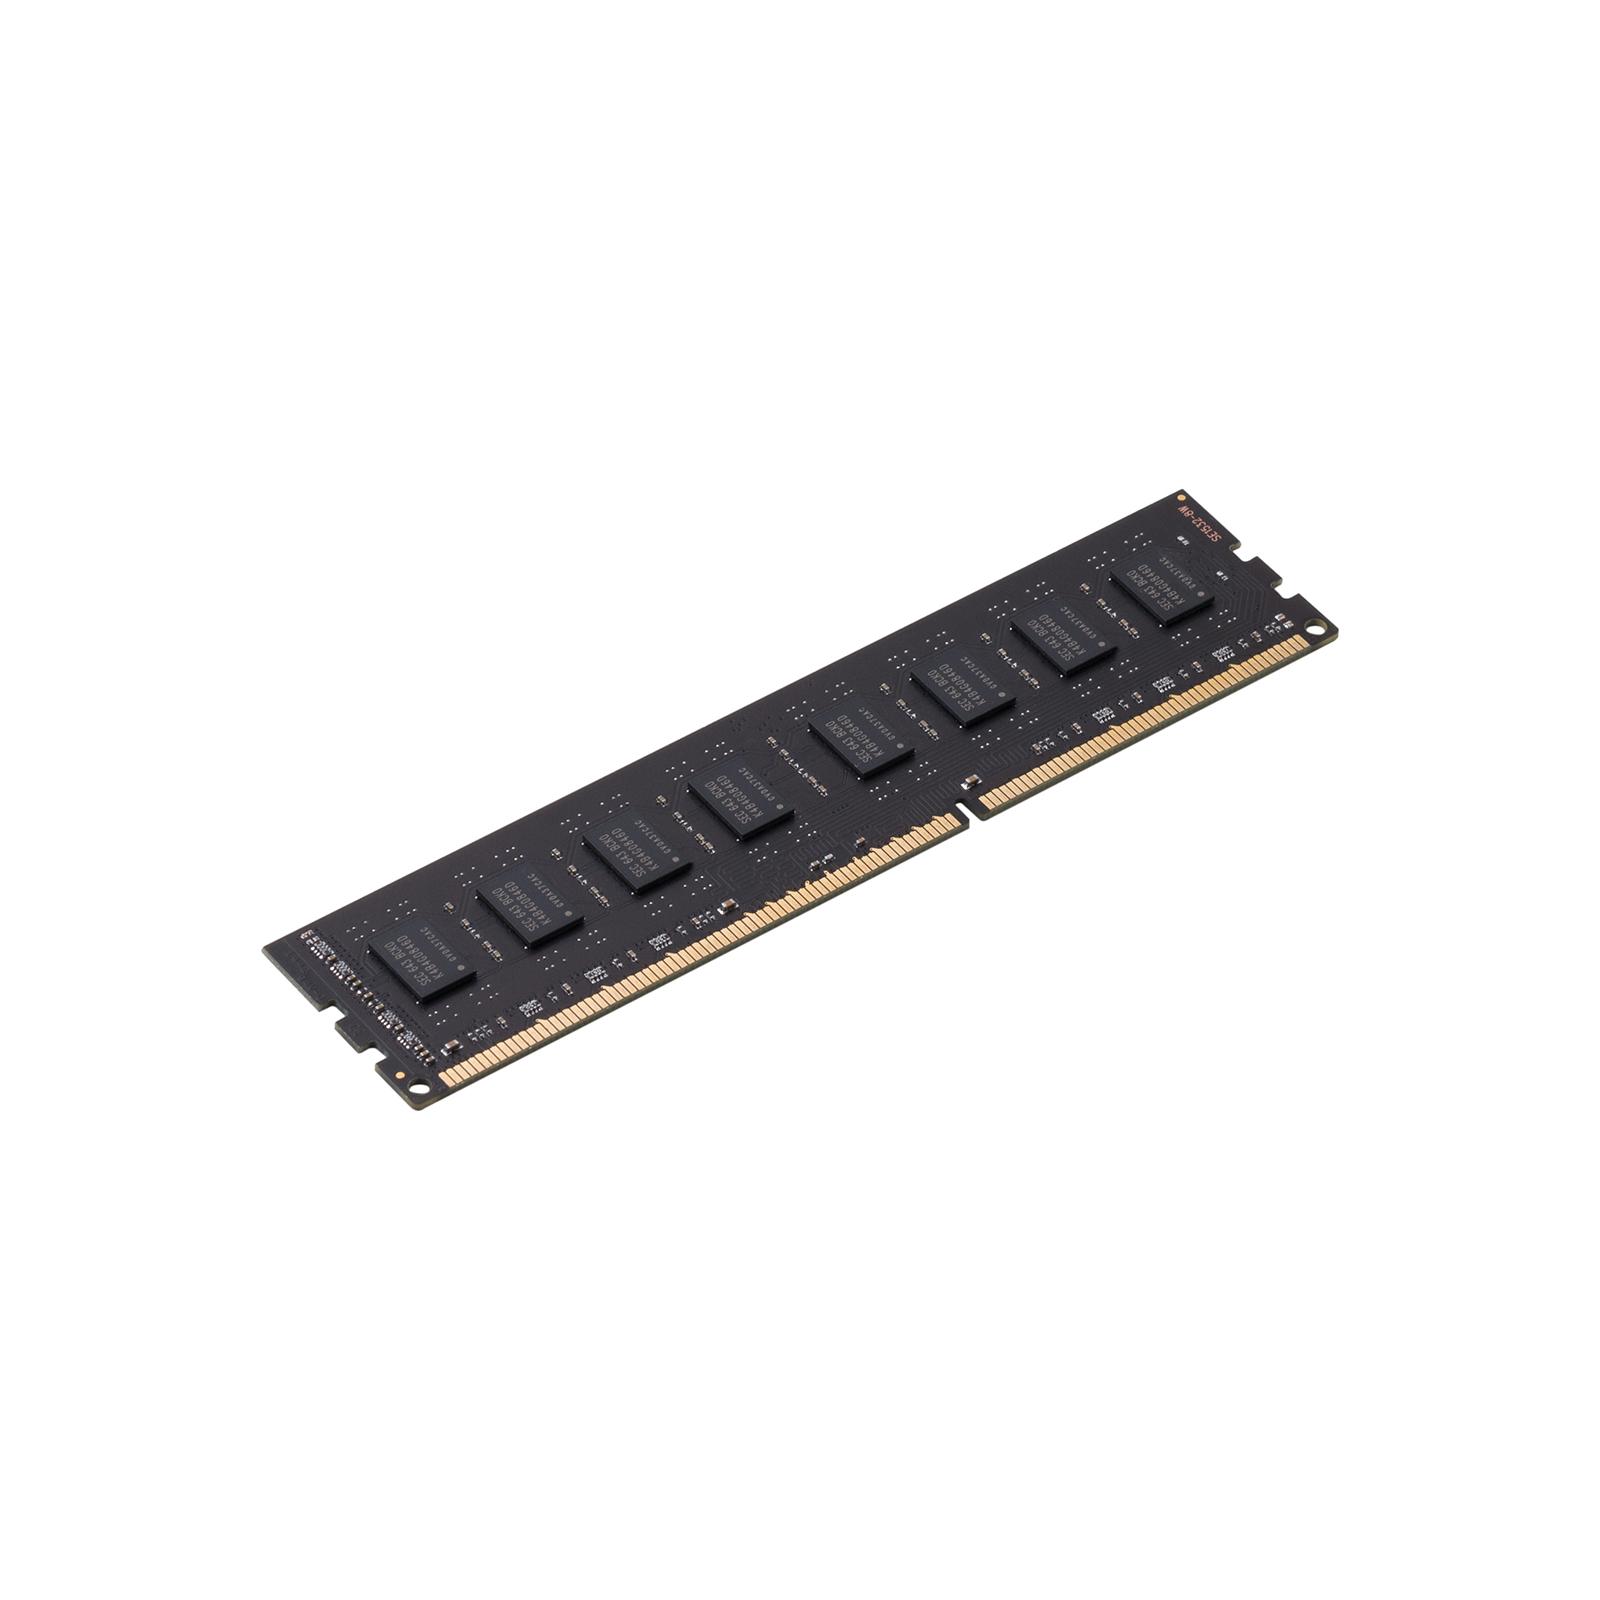 Модуль памяти для компьютера DDR3L 8GB 1600 MHz Samsung (M378B1G73EB0-YK0) изображение 2